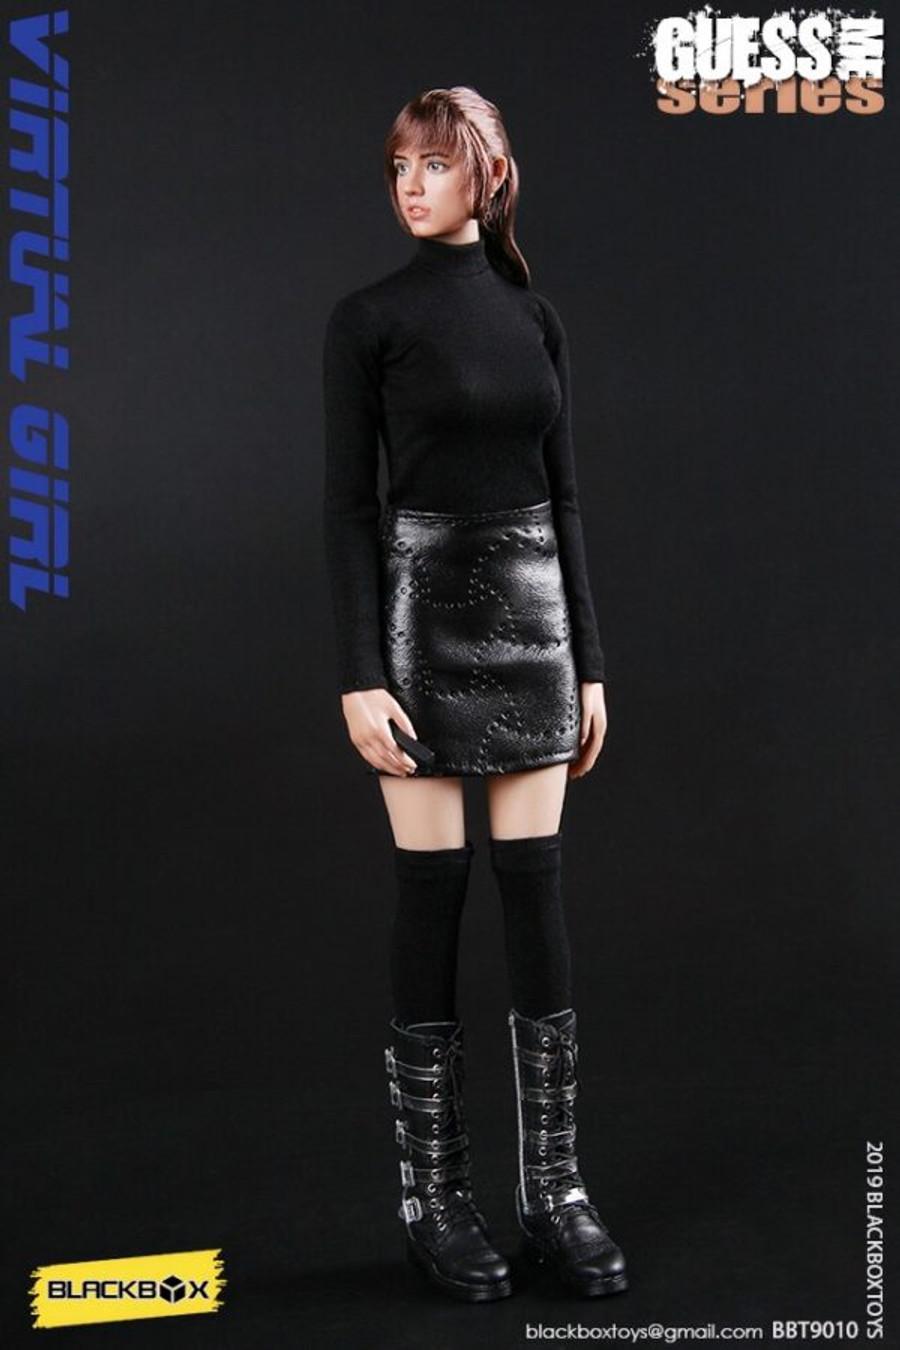 Blackbox - Guess Me Series: Virtual Girl Set